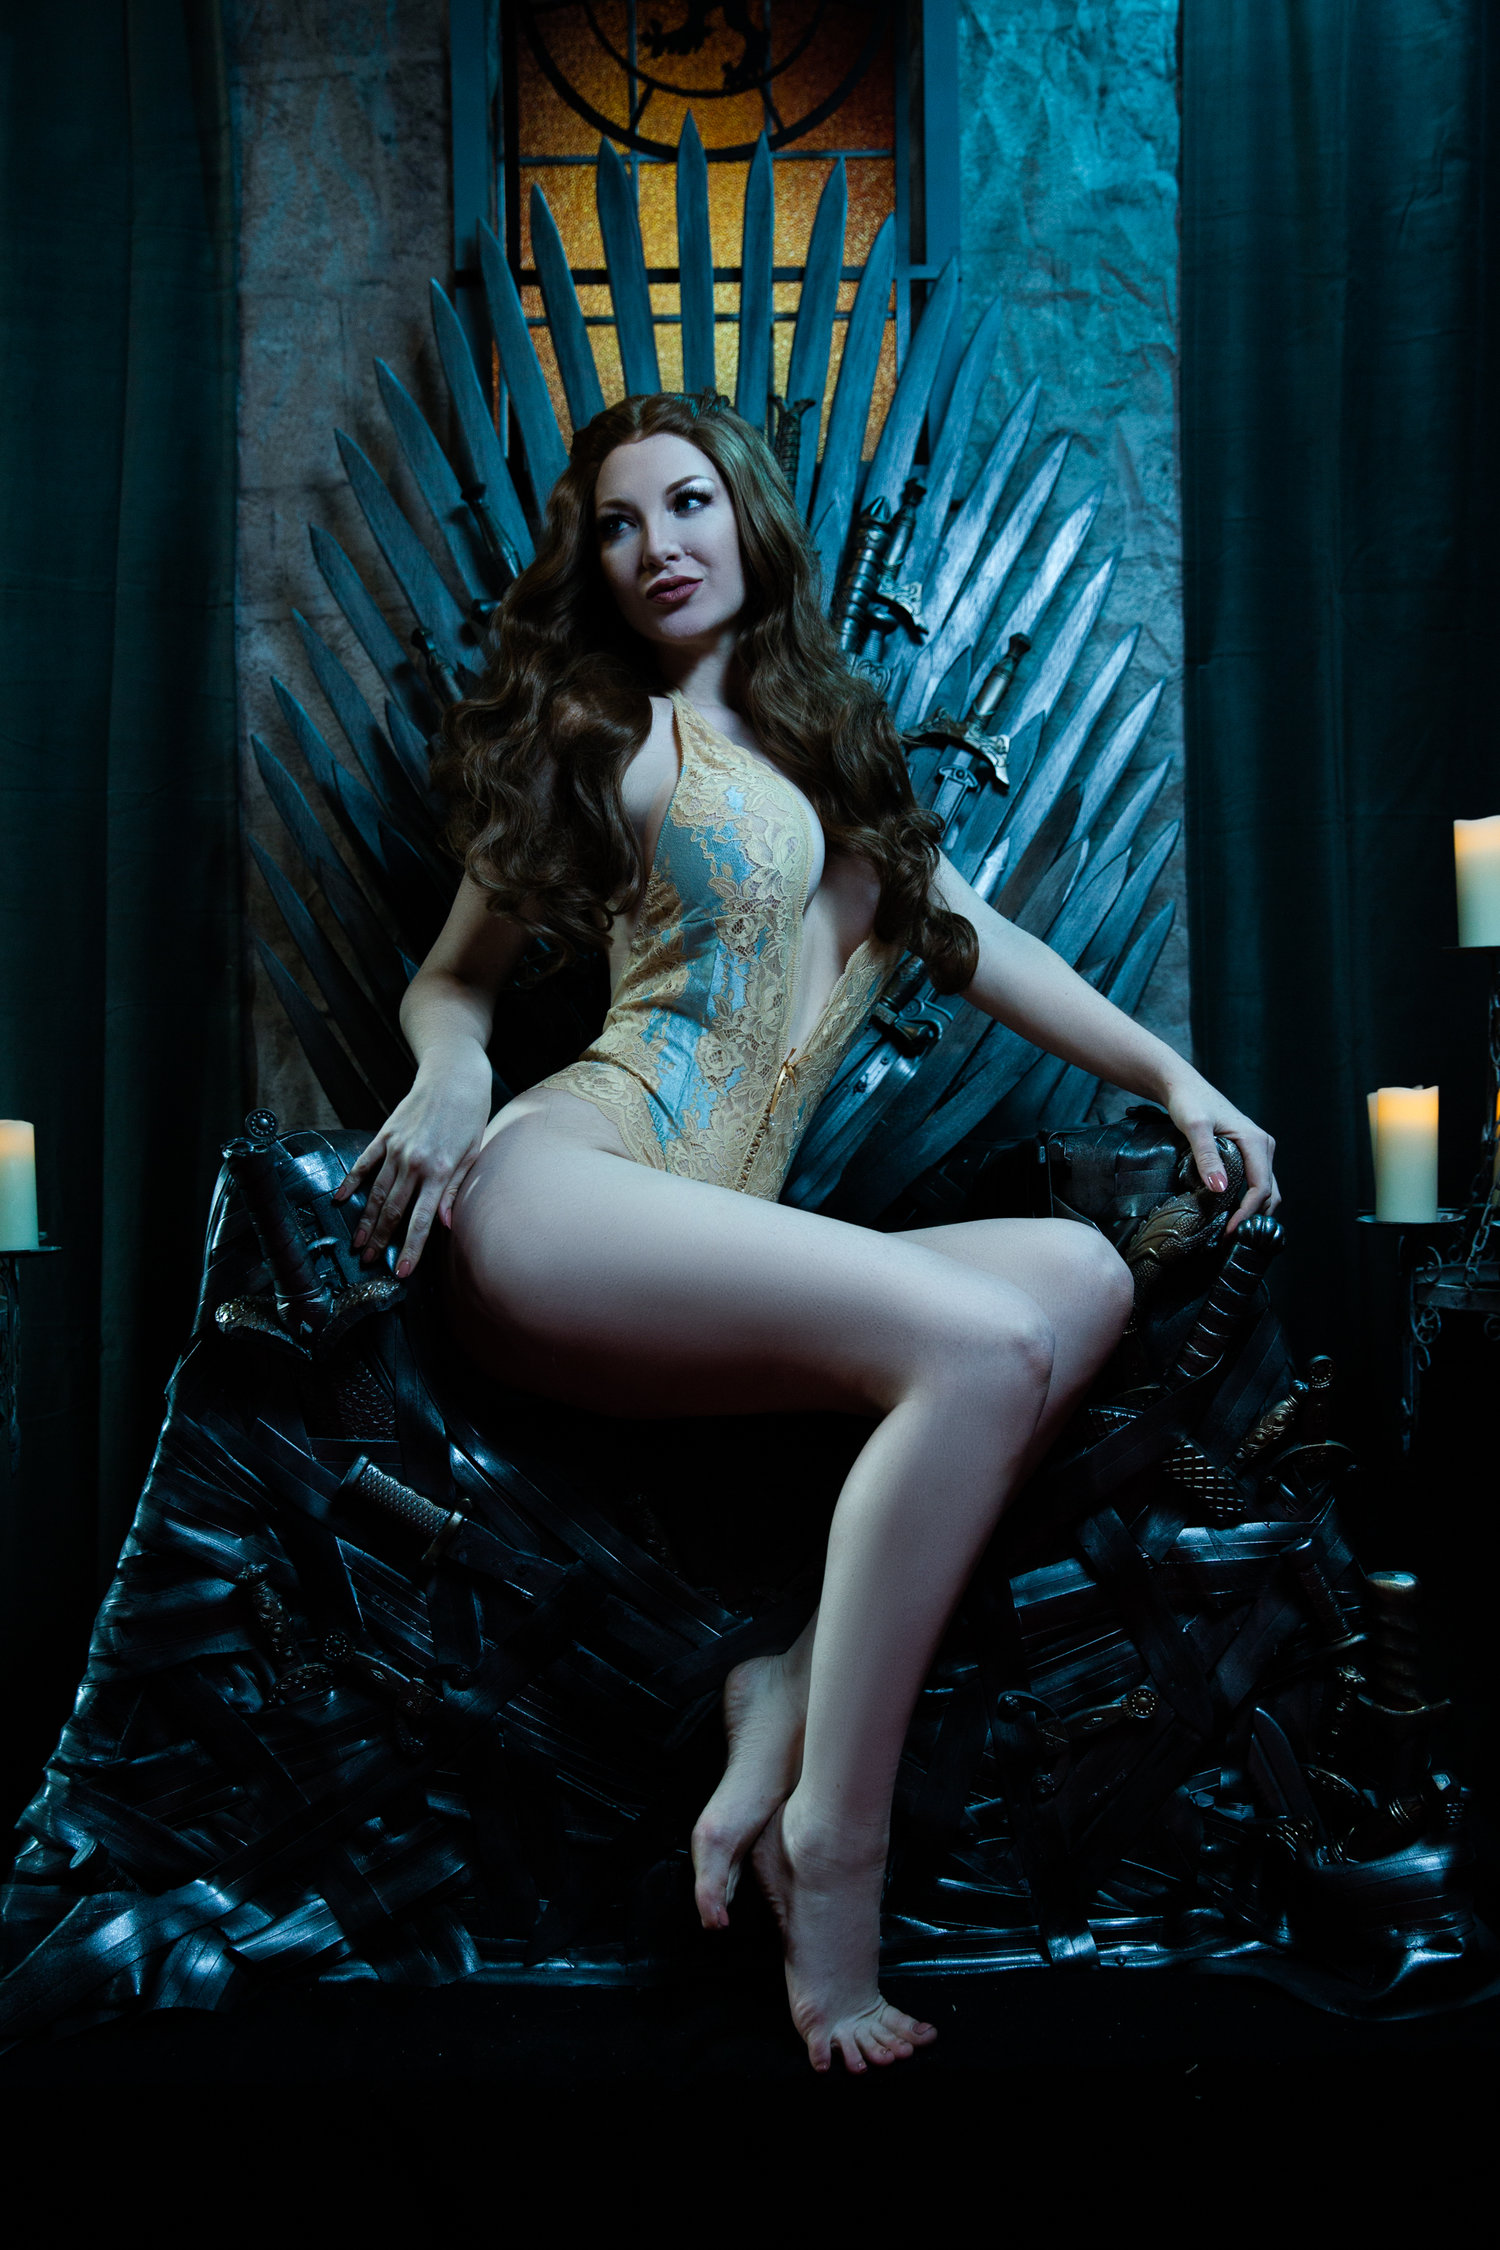 Thrones hot margaery of game Dean